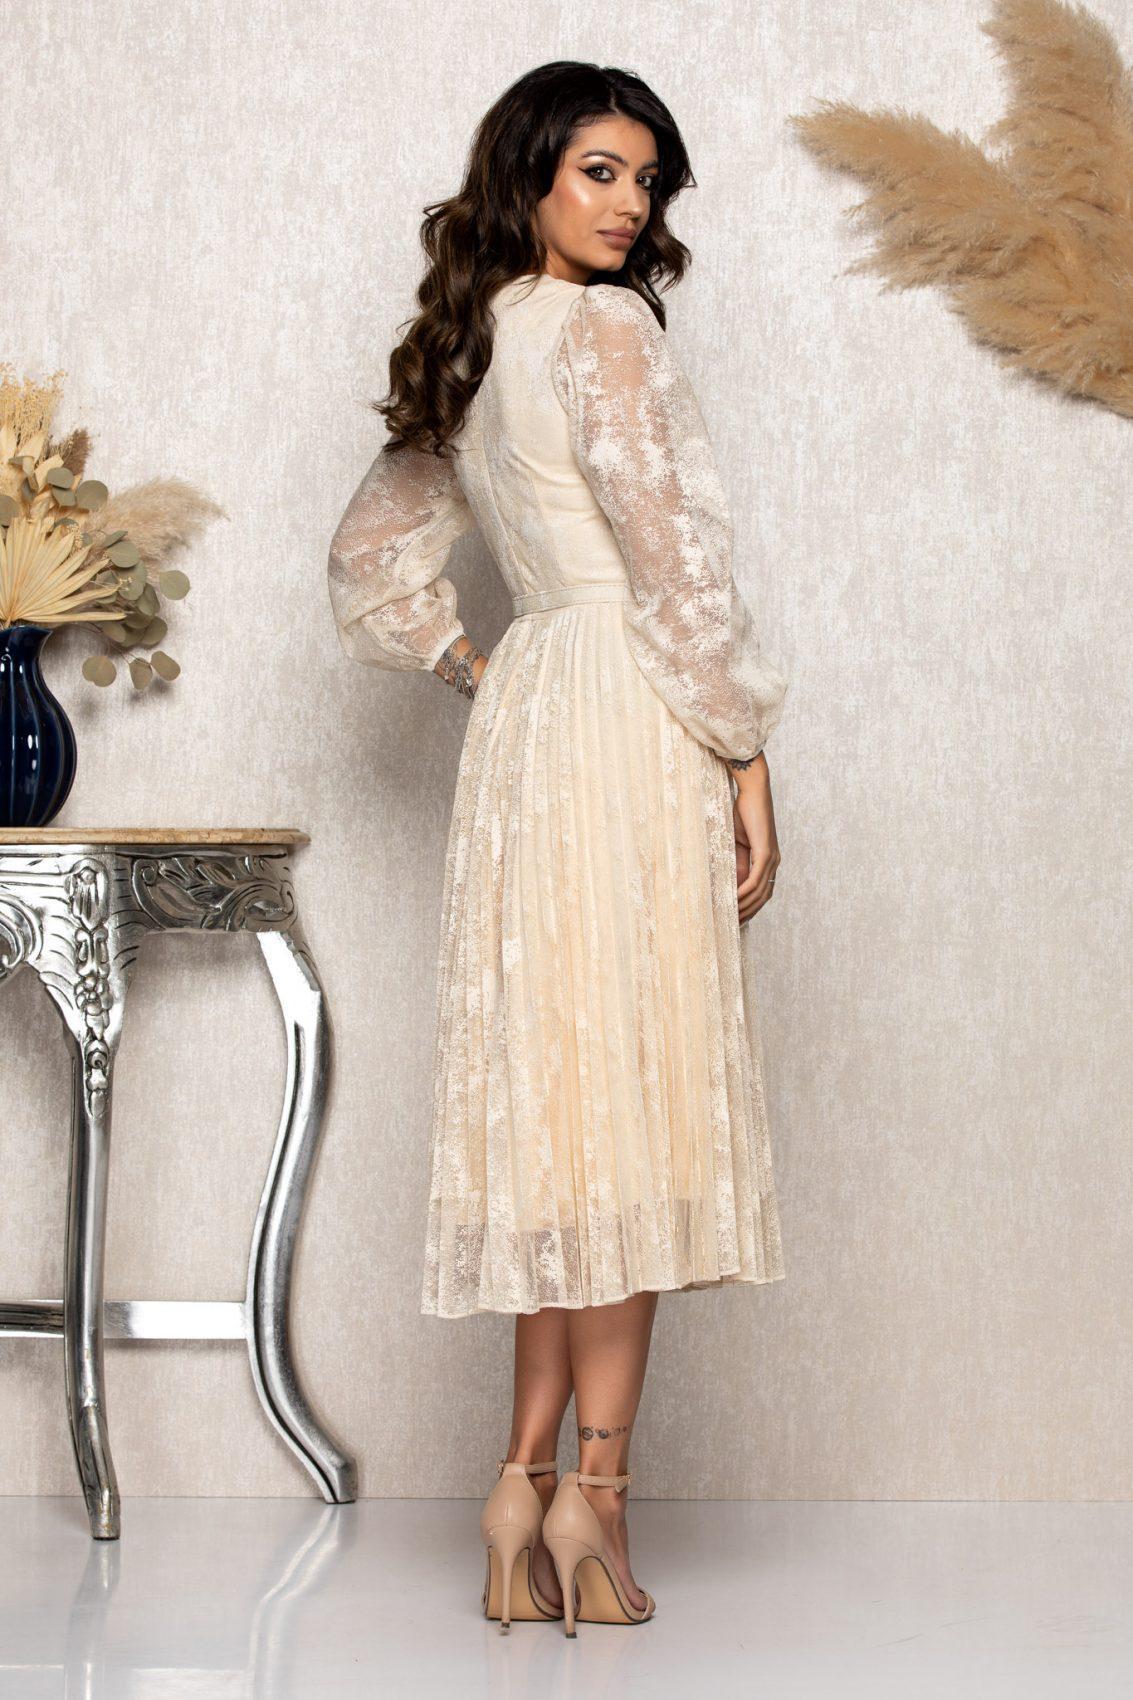 Nude Μίντι Βραδινό Φόρεμα Από Δαντέλα Genoveva B118 2